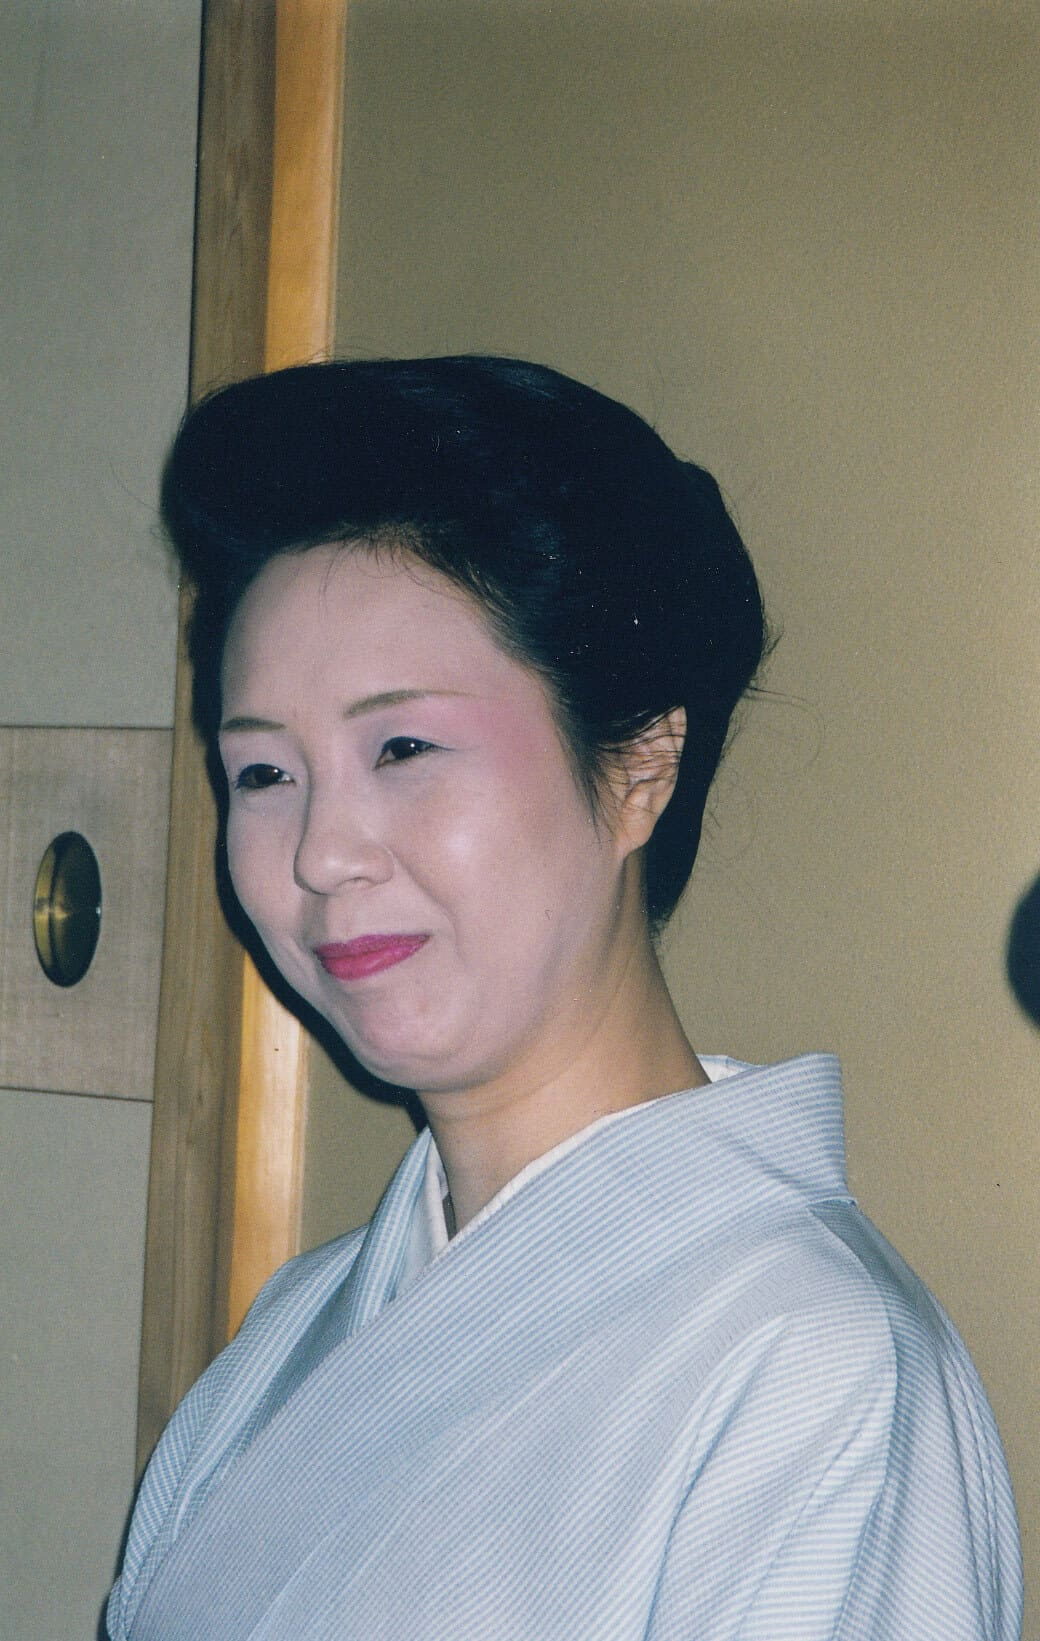 Kiyoha in geisha mode around 2000